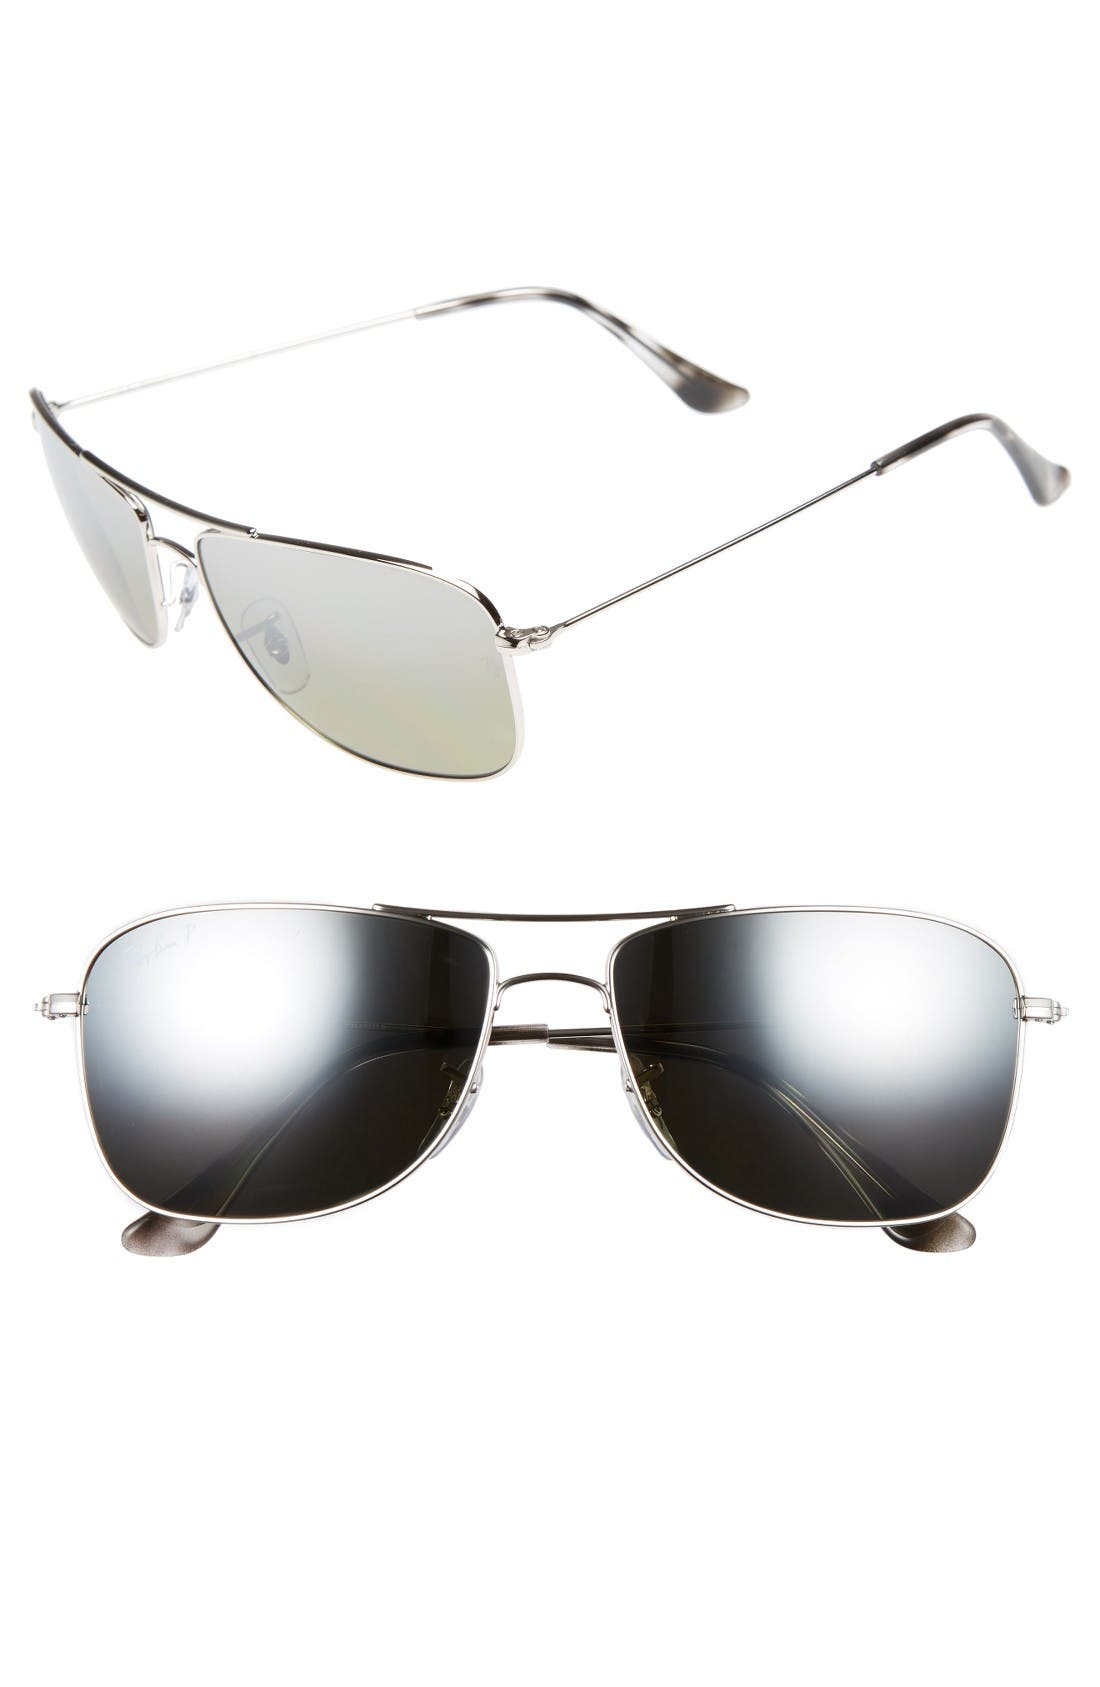 Main Image - Ray-Ban 59mm Chromance Aviator Sunglasses